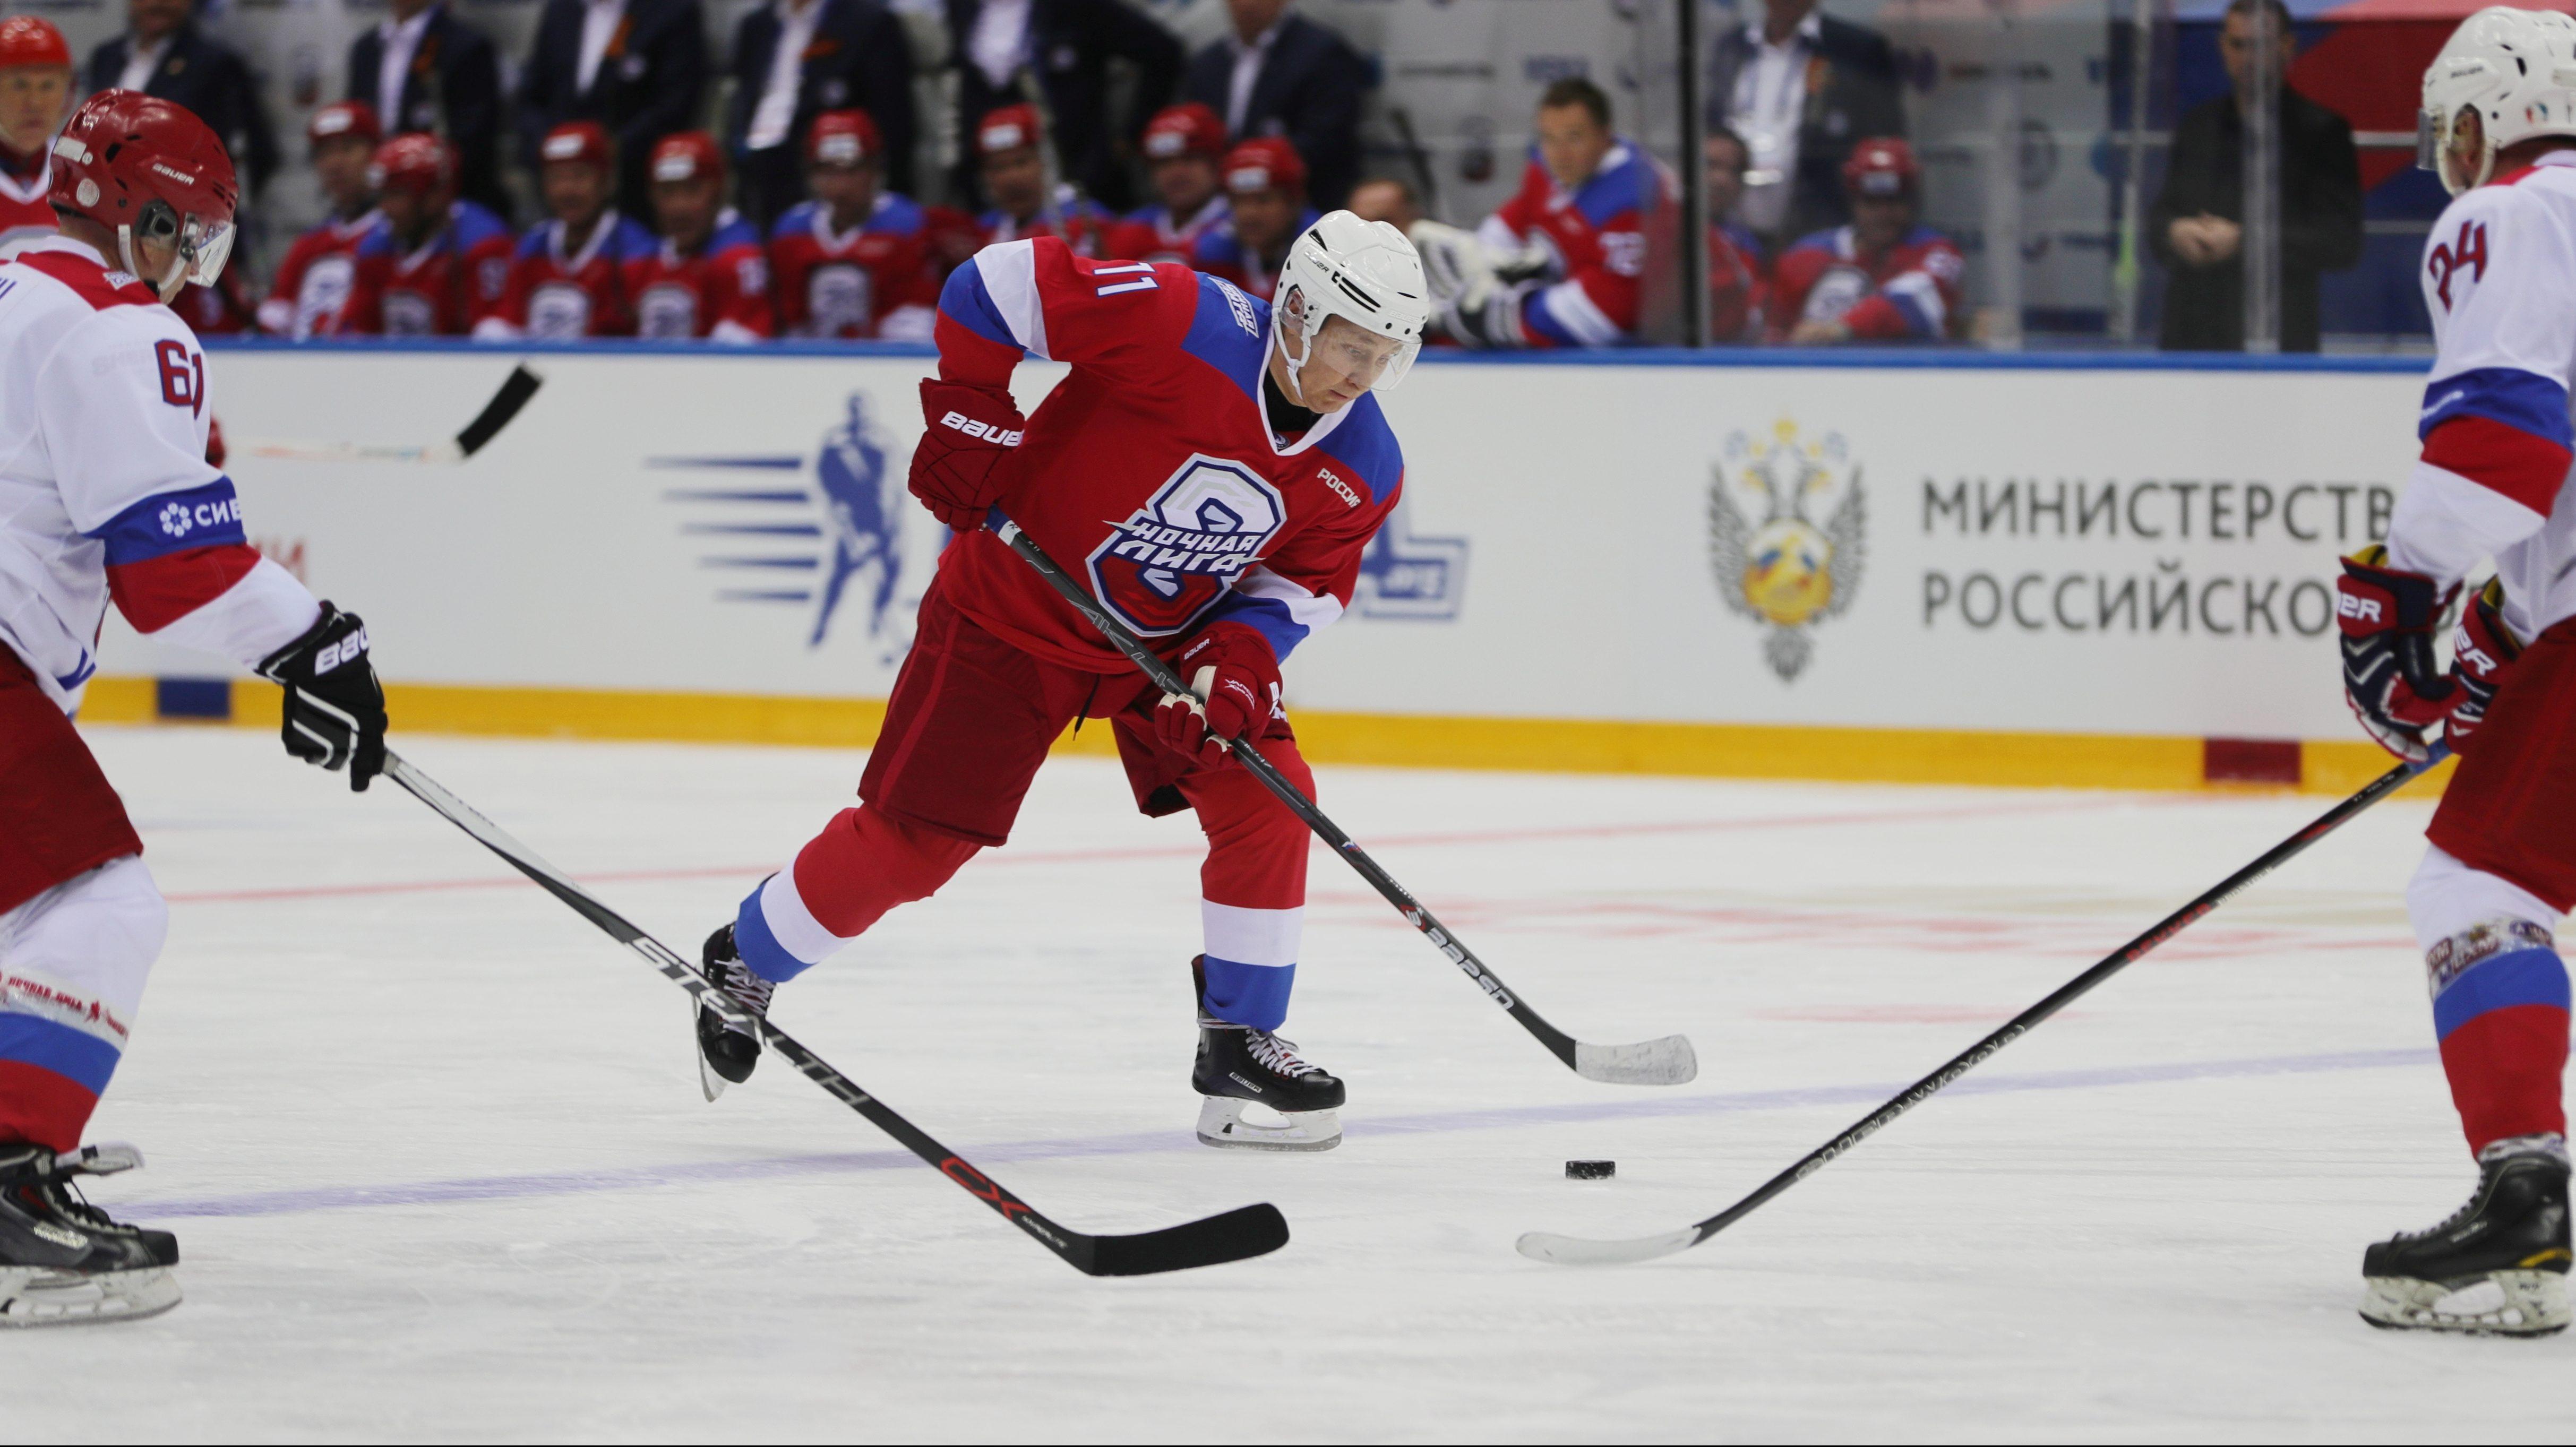 Vladimir Putin Is Playing The Best Hockey Of His Life At Age 66 Quartz